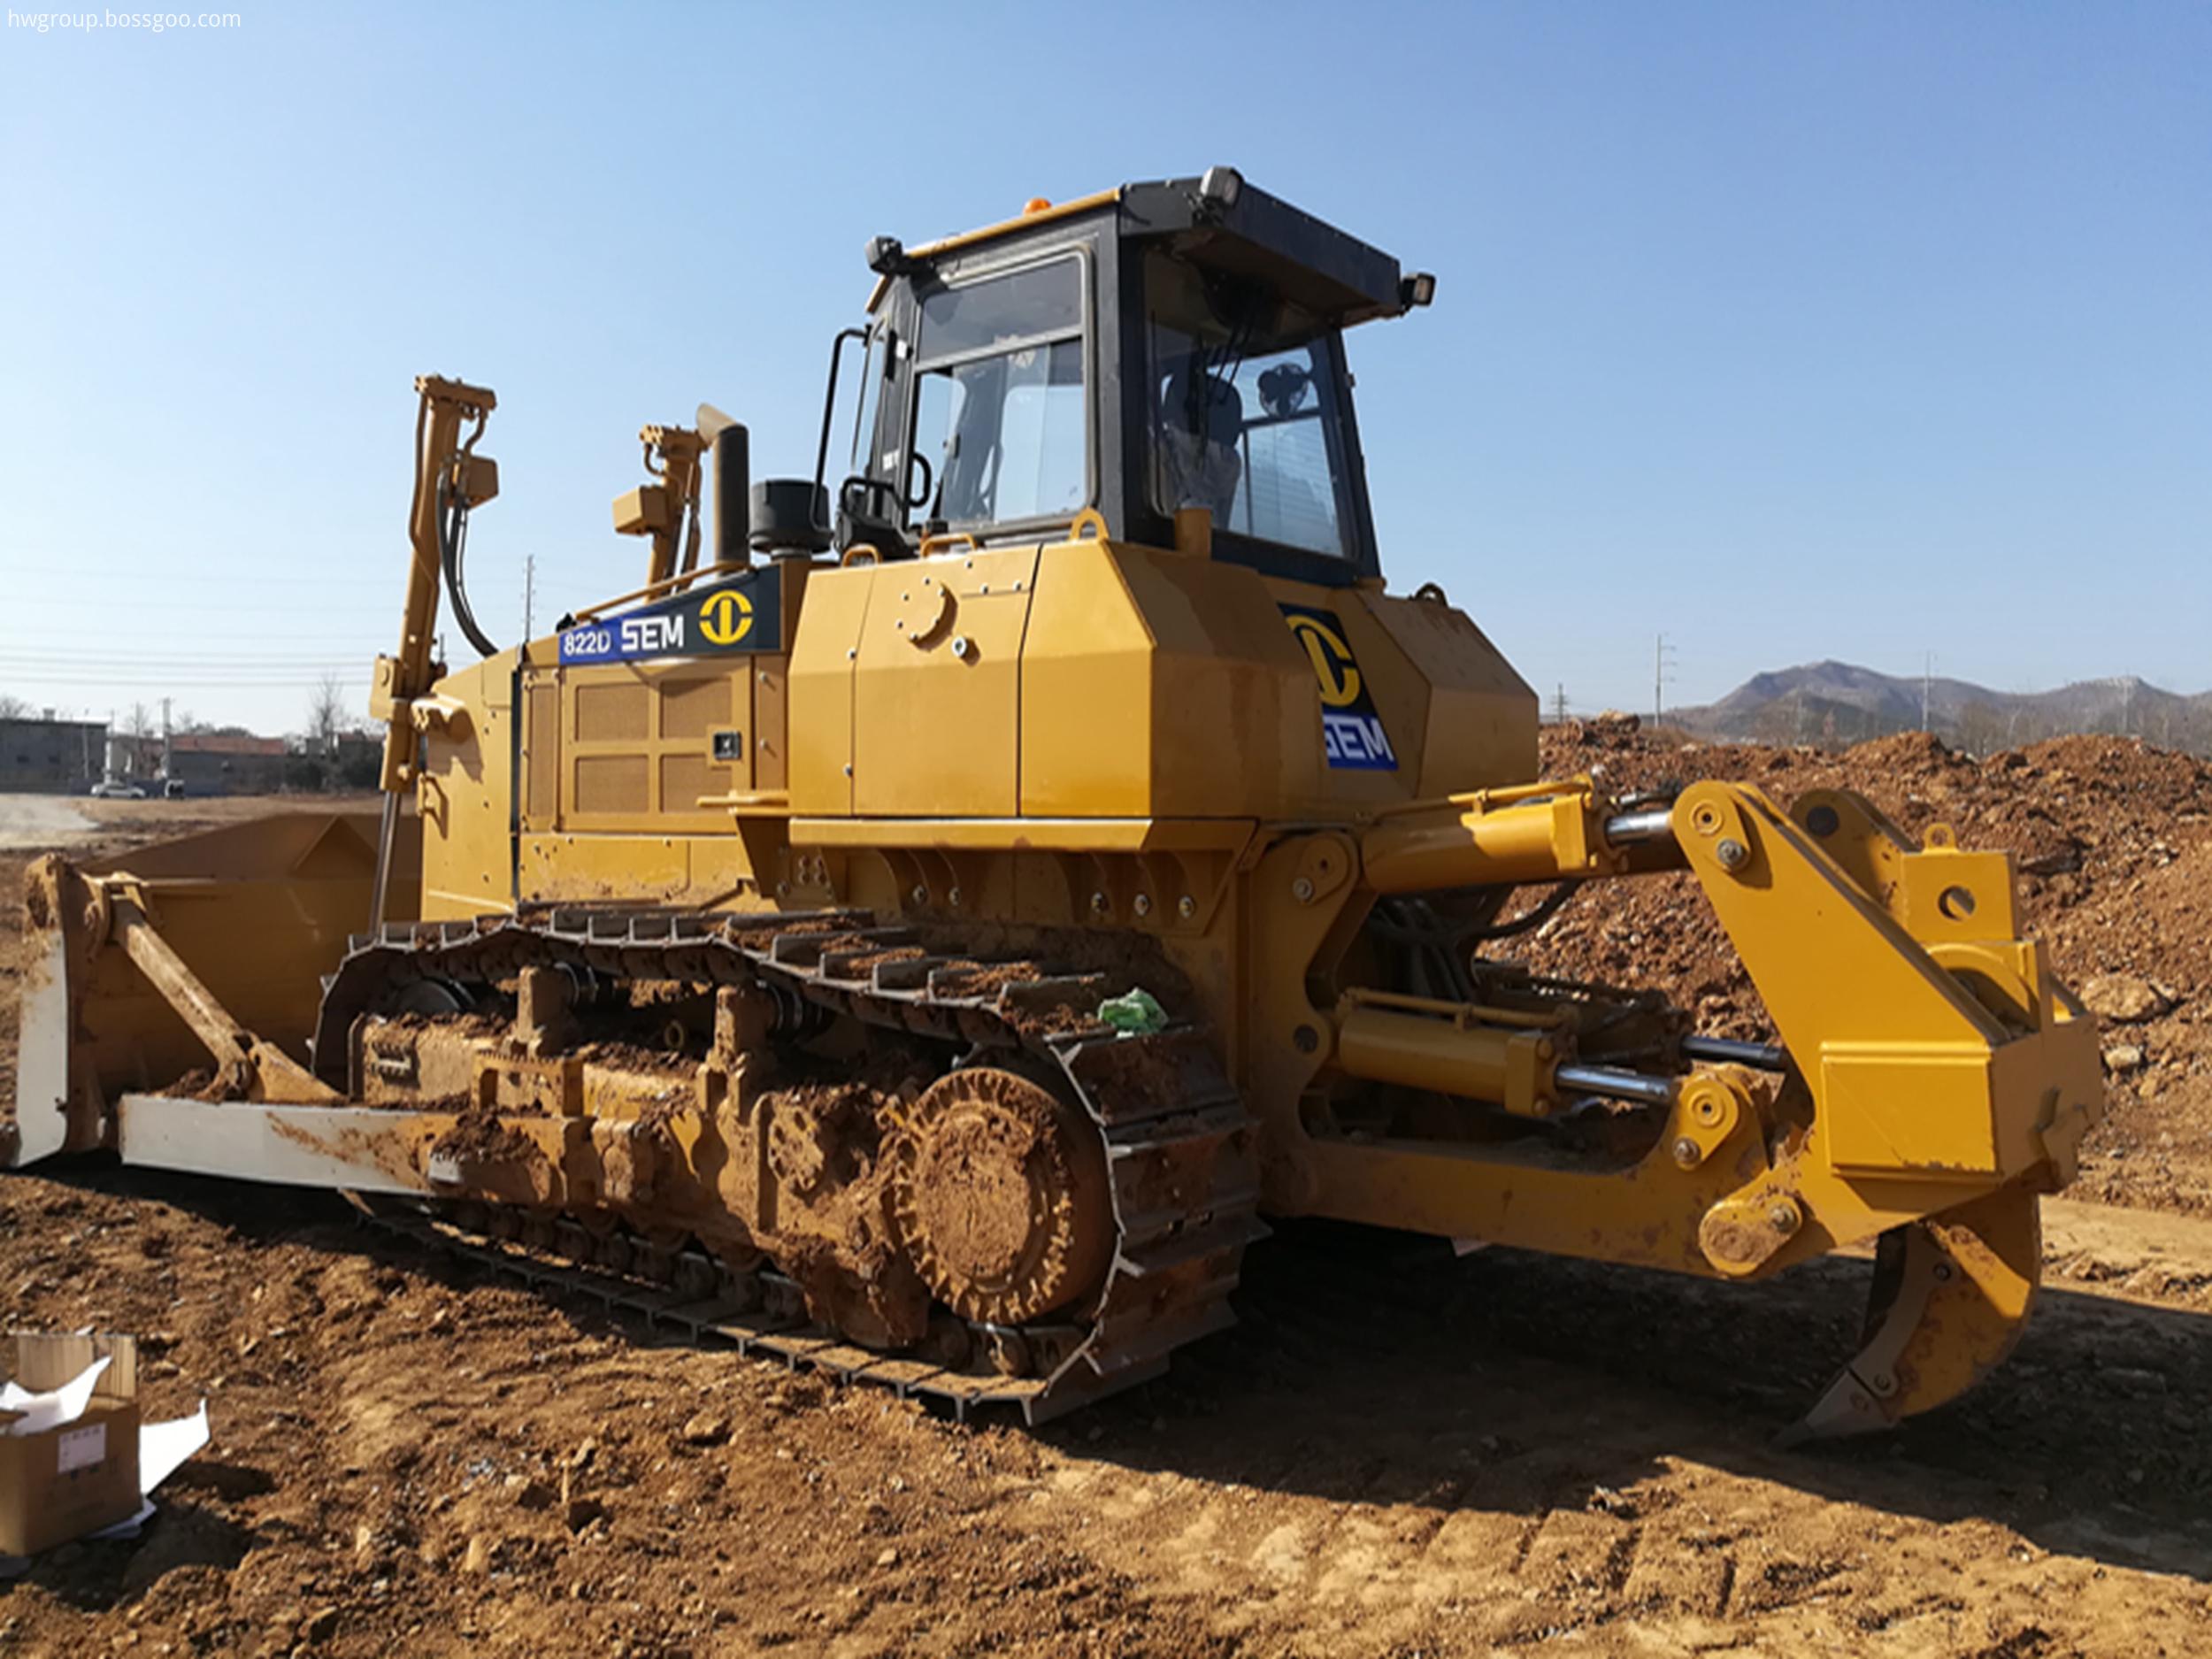 SEM bulldozer